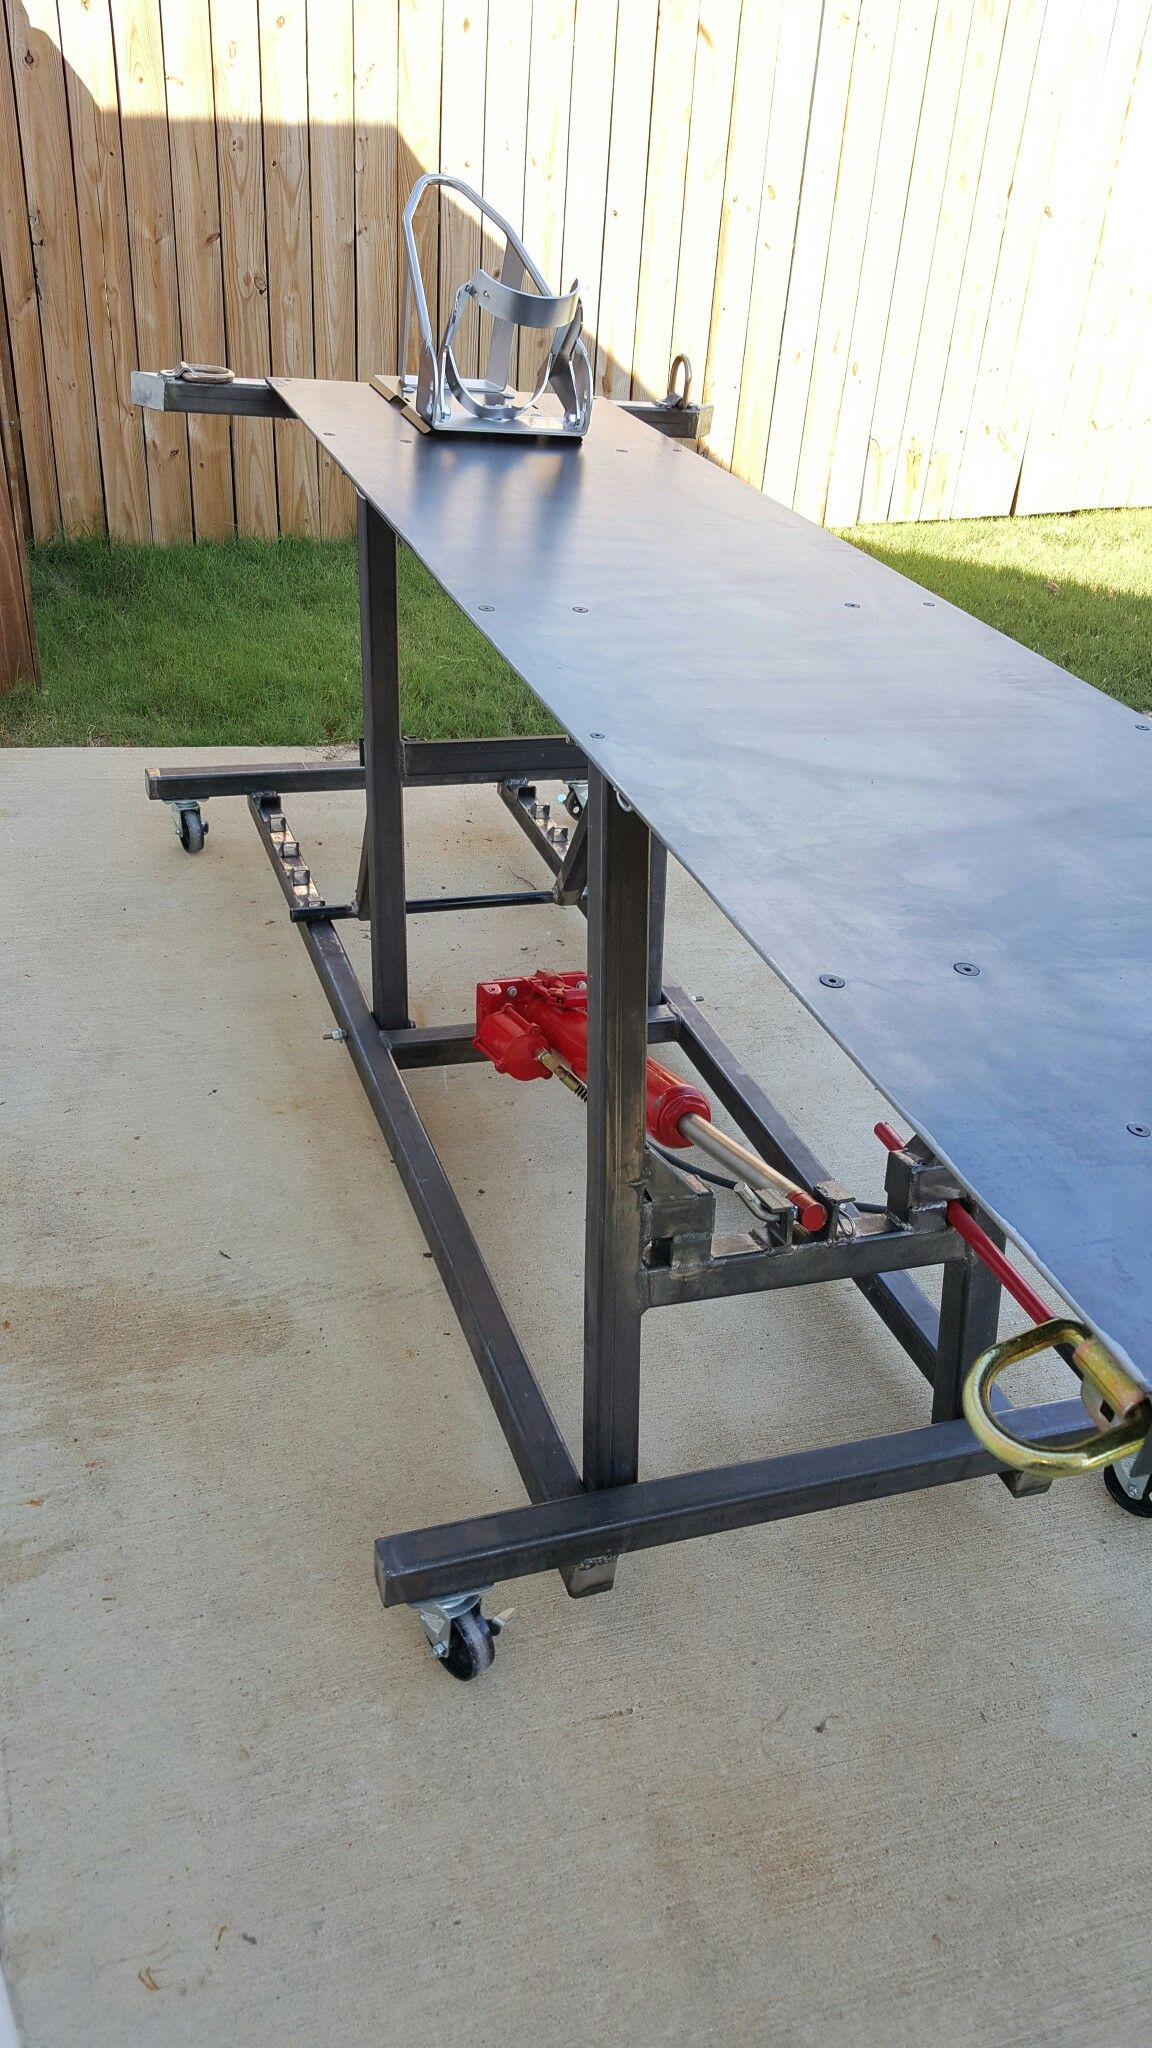 Hydraulic Motorcycle Lift Table 8t Pneumatic Isted Jack Ram Bike Pro Wheel